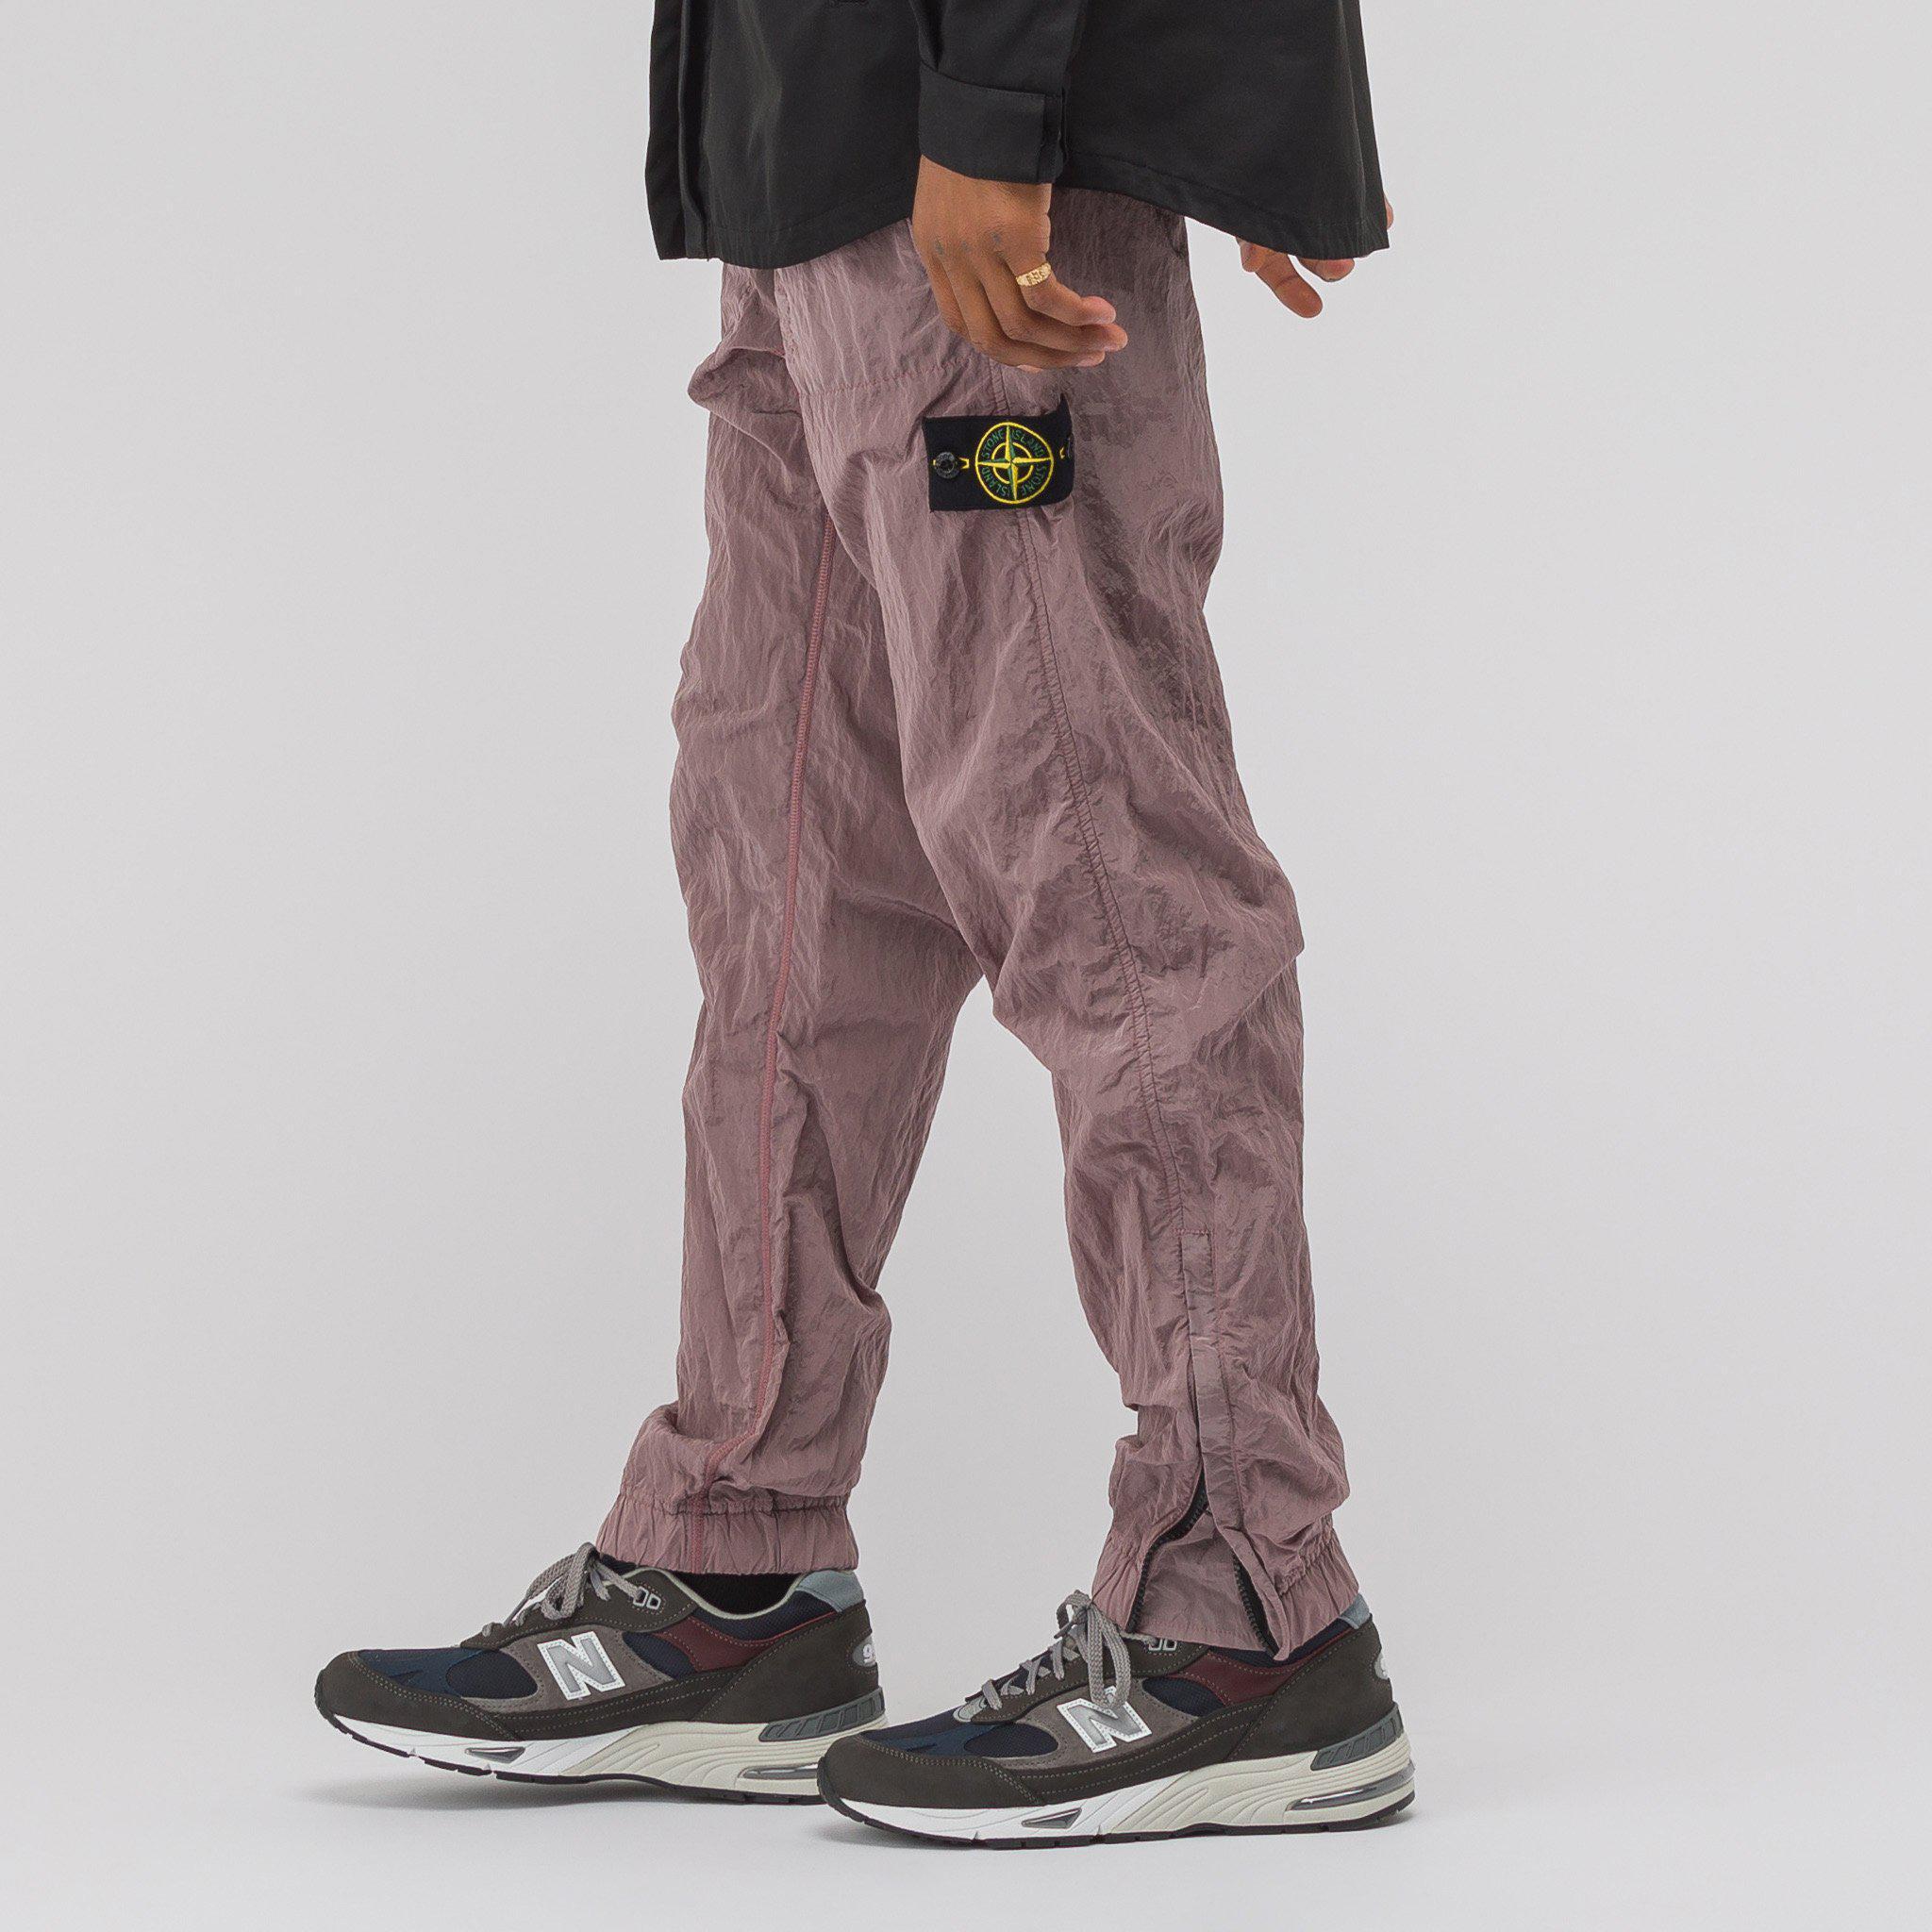 Sneaker Adidas Originals Adidas Damen Sneaker 0mN8vwn